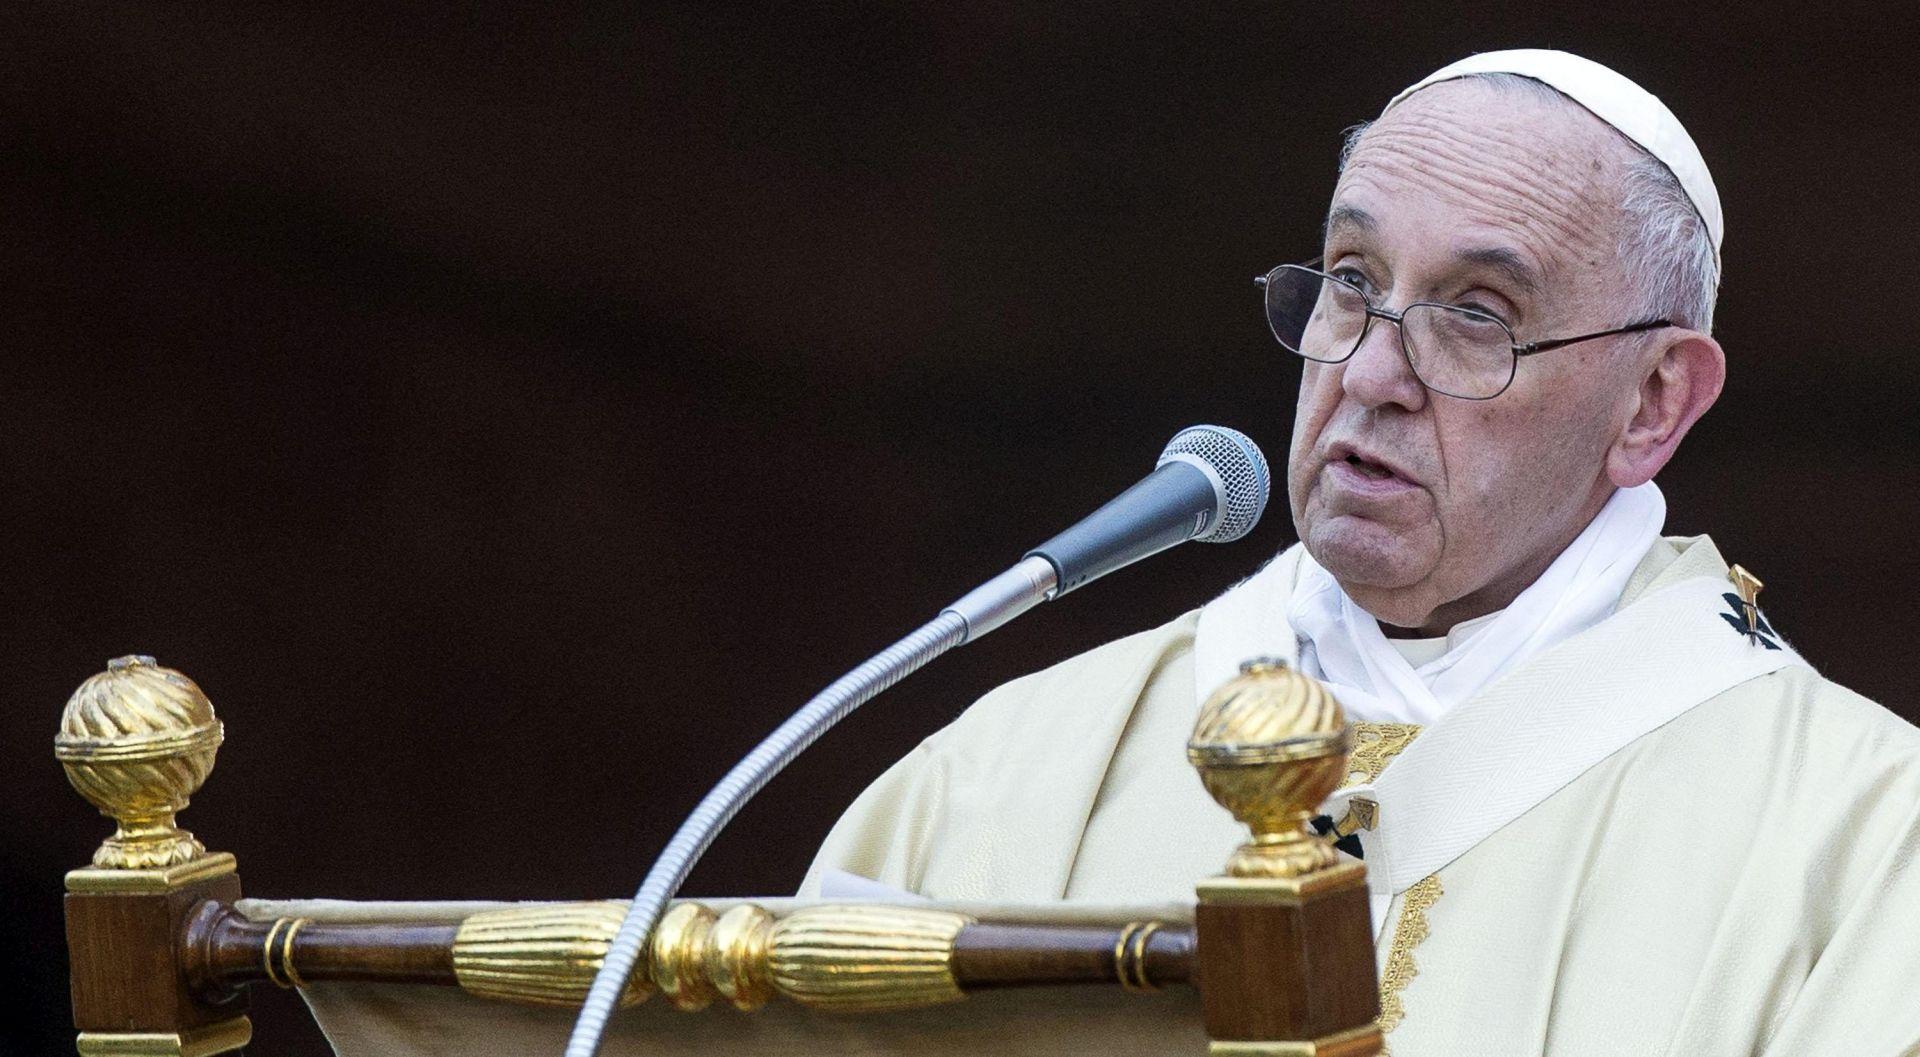 Papa ogorčen novim Vatileaksom, ali odlučan u provedbi reformi